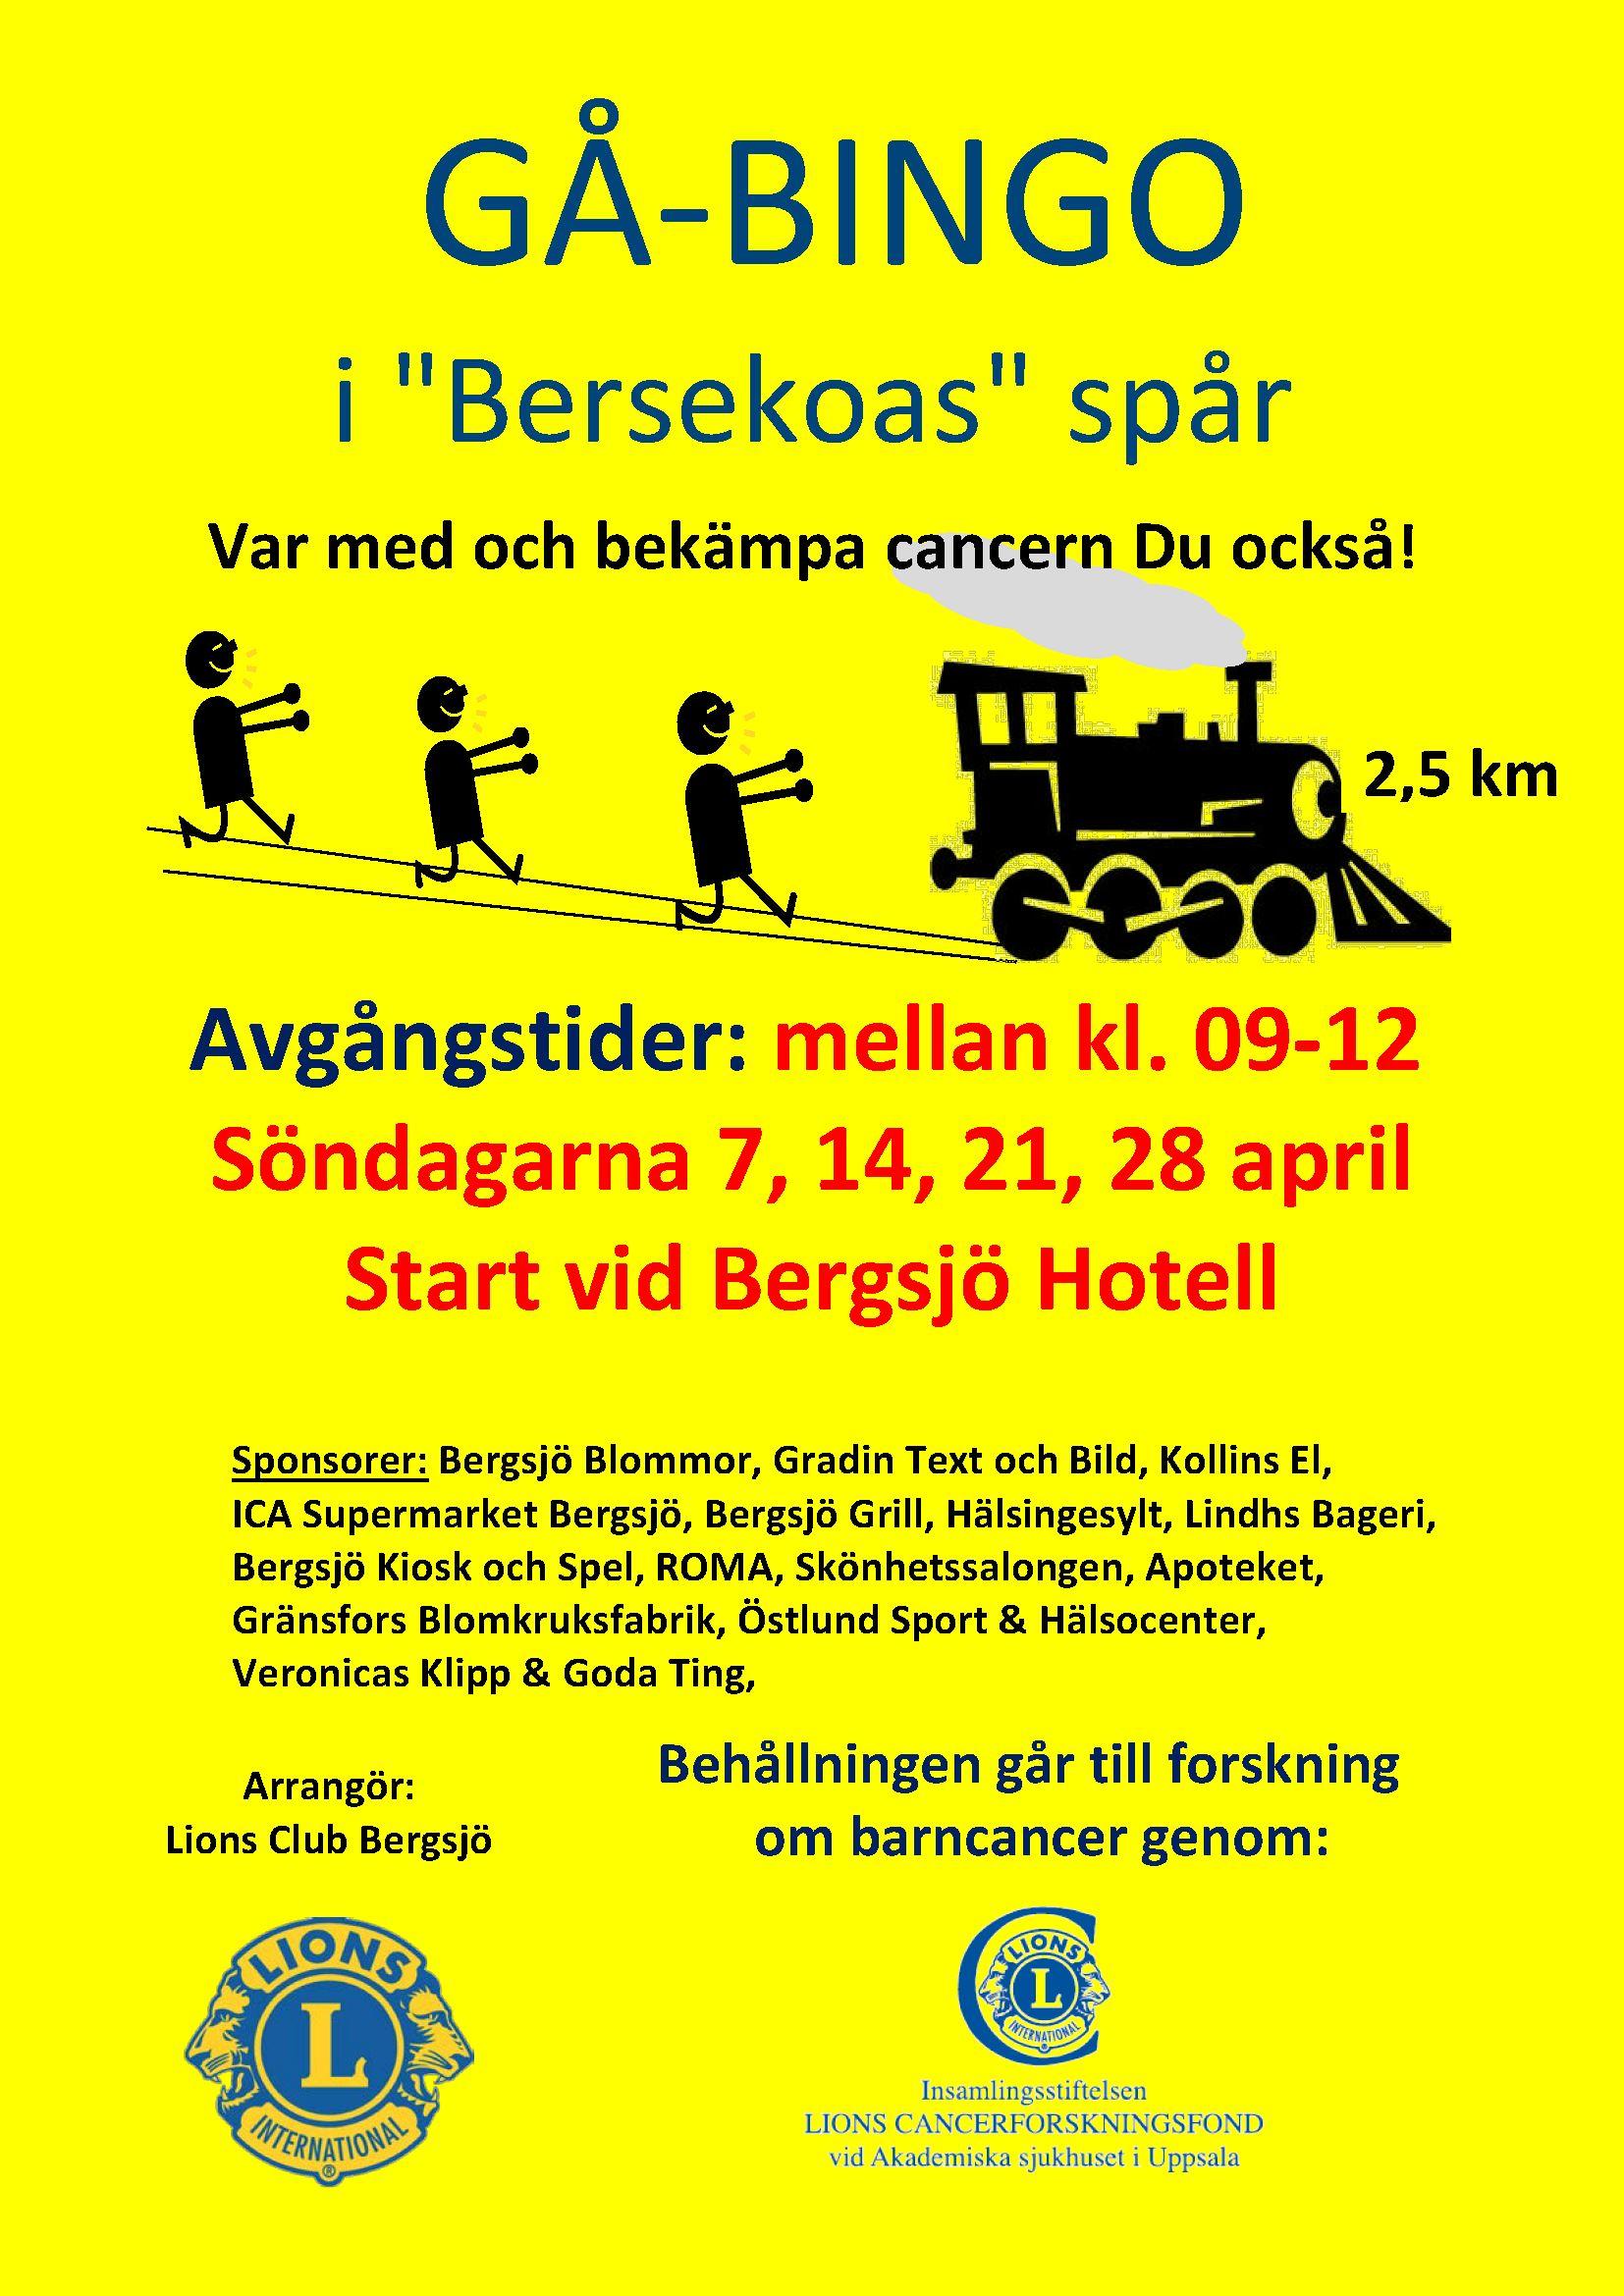 © gå-bingo, bergsjö, lions club, nordanstig, gå-bingo, bergsjö, lions club, nordanstig